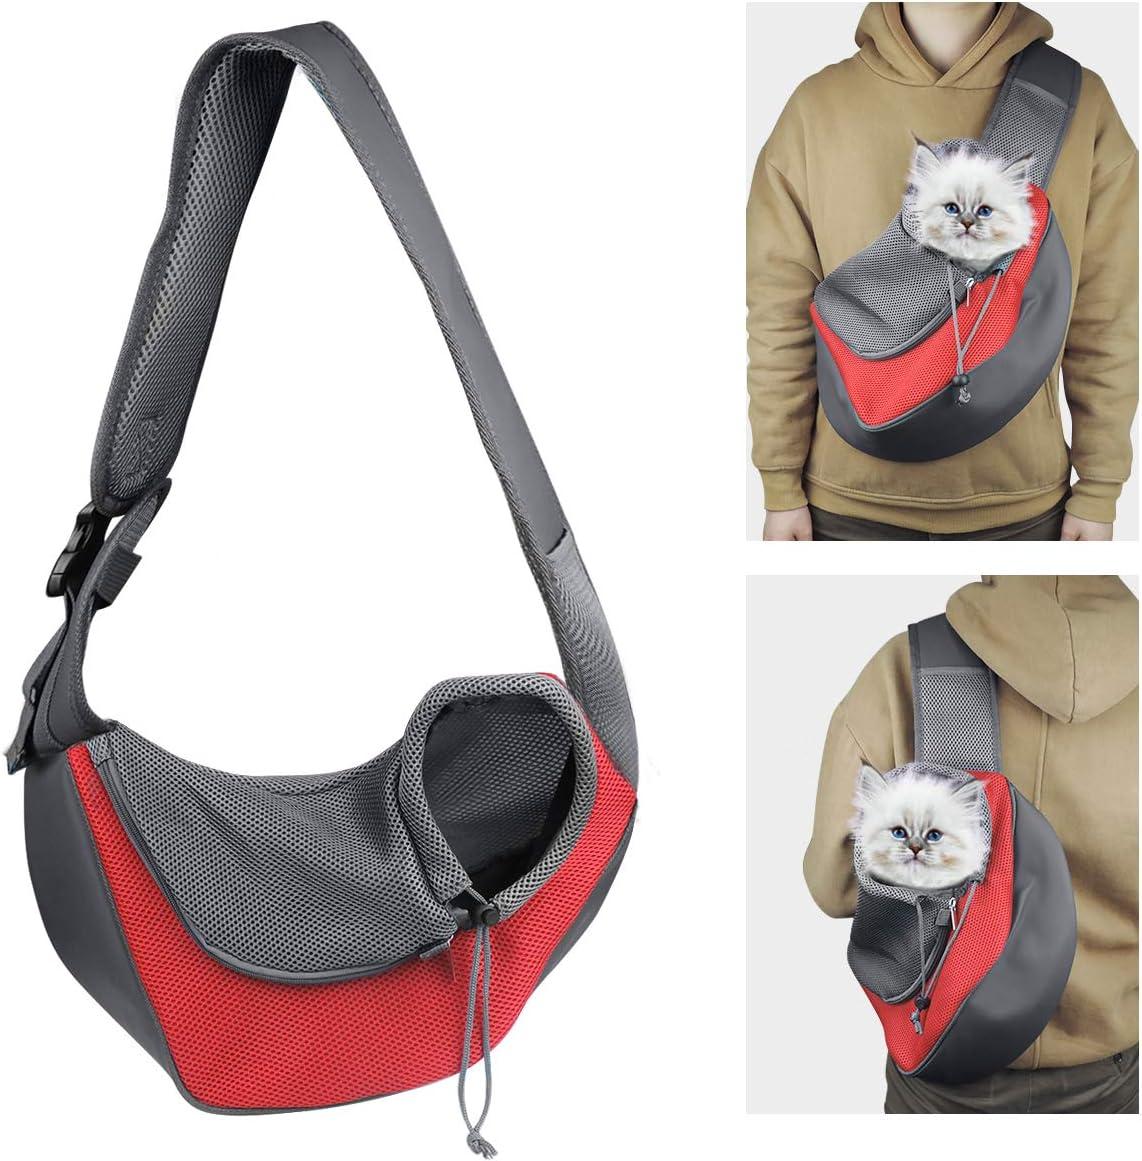 YouJia Pet Dog Sling Carrier, Breathable Mesh Travelling Pet Hands-Free Sling Bag Adjustable Padded Strap Front Pouch Single Shoulder Bag for Dogs Cats